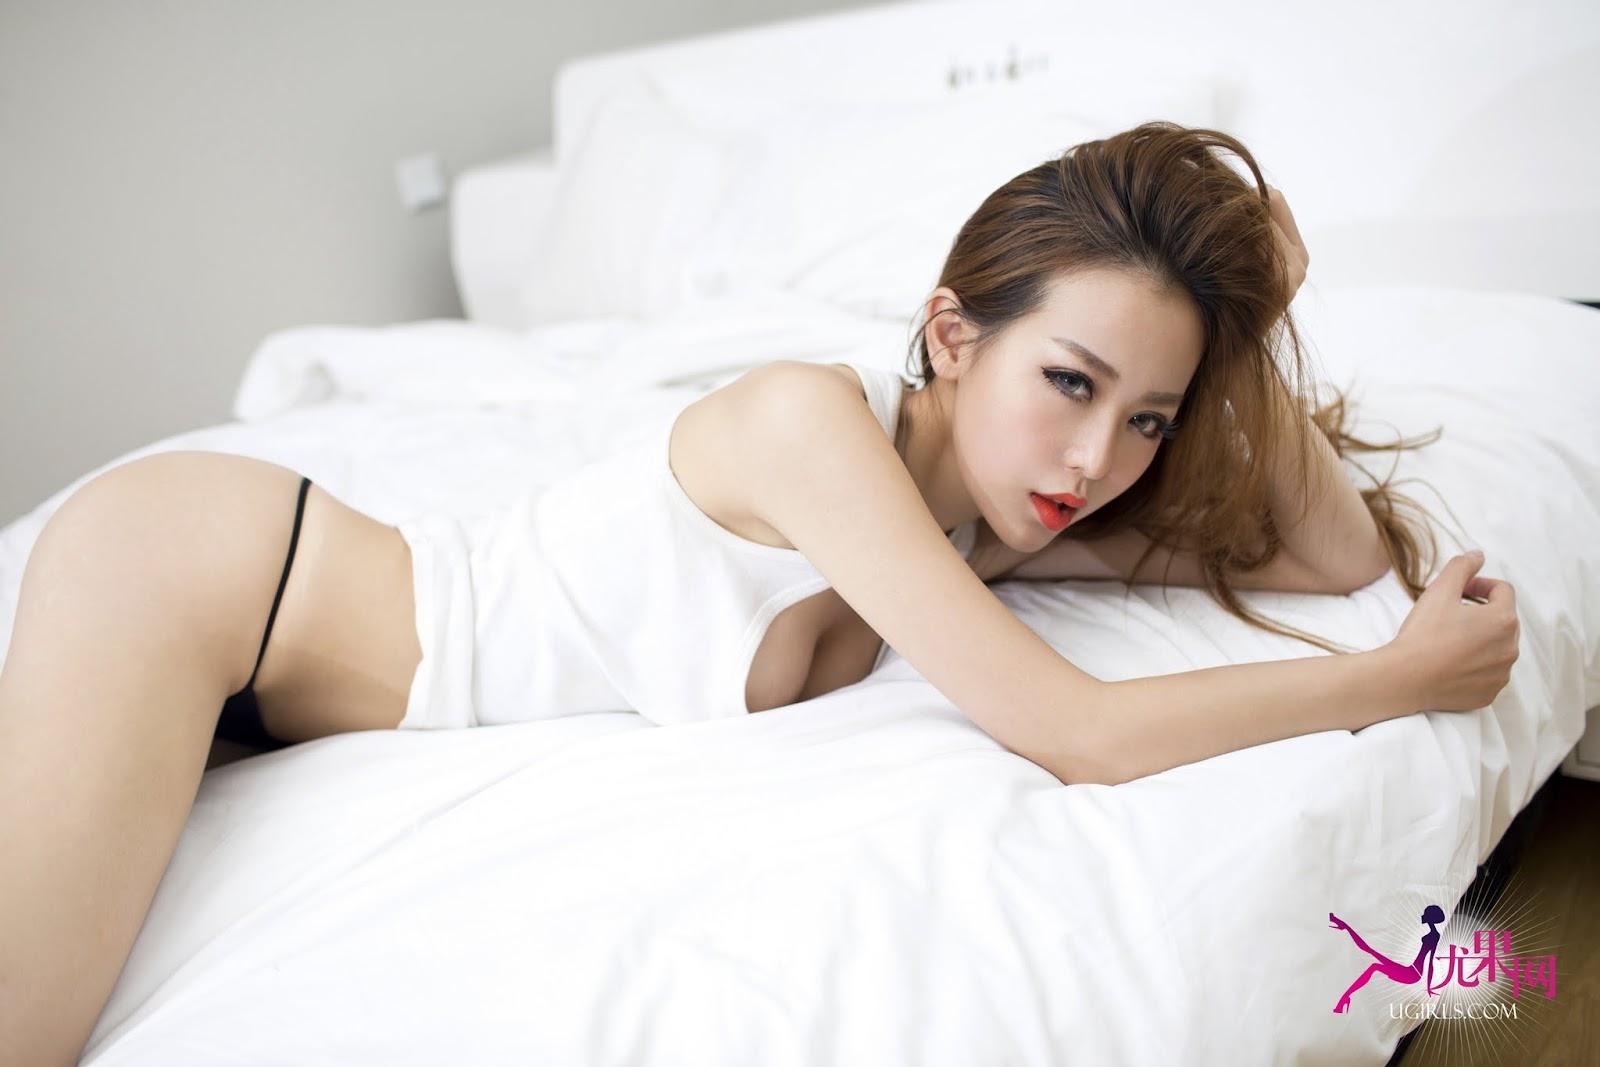 U091%2B%252845%2529 - Sexy Photo UGIRLS NO.91 Nude Girl